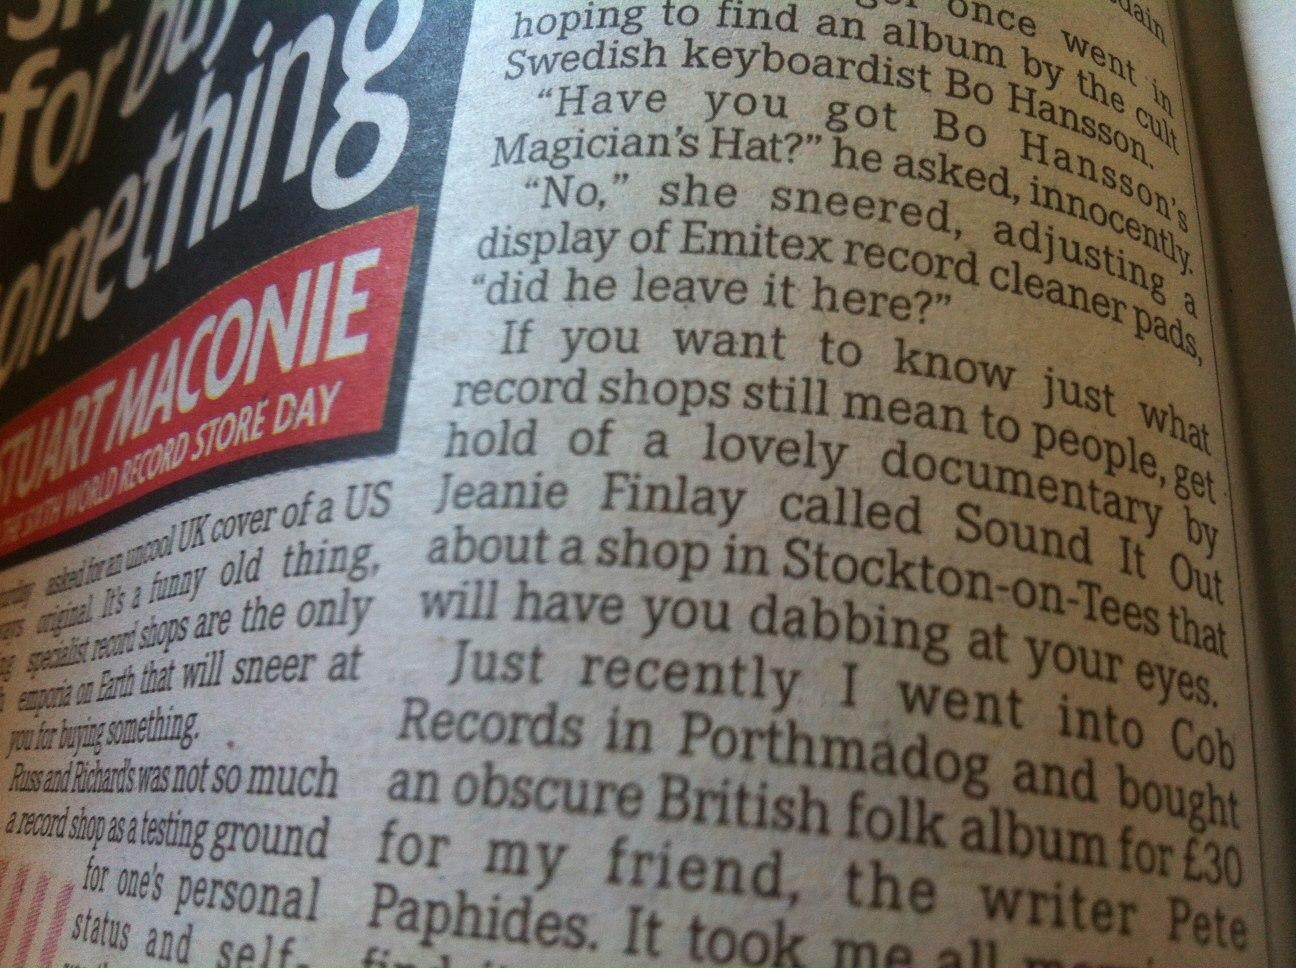 Stuart Maconie in Daily Mirror